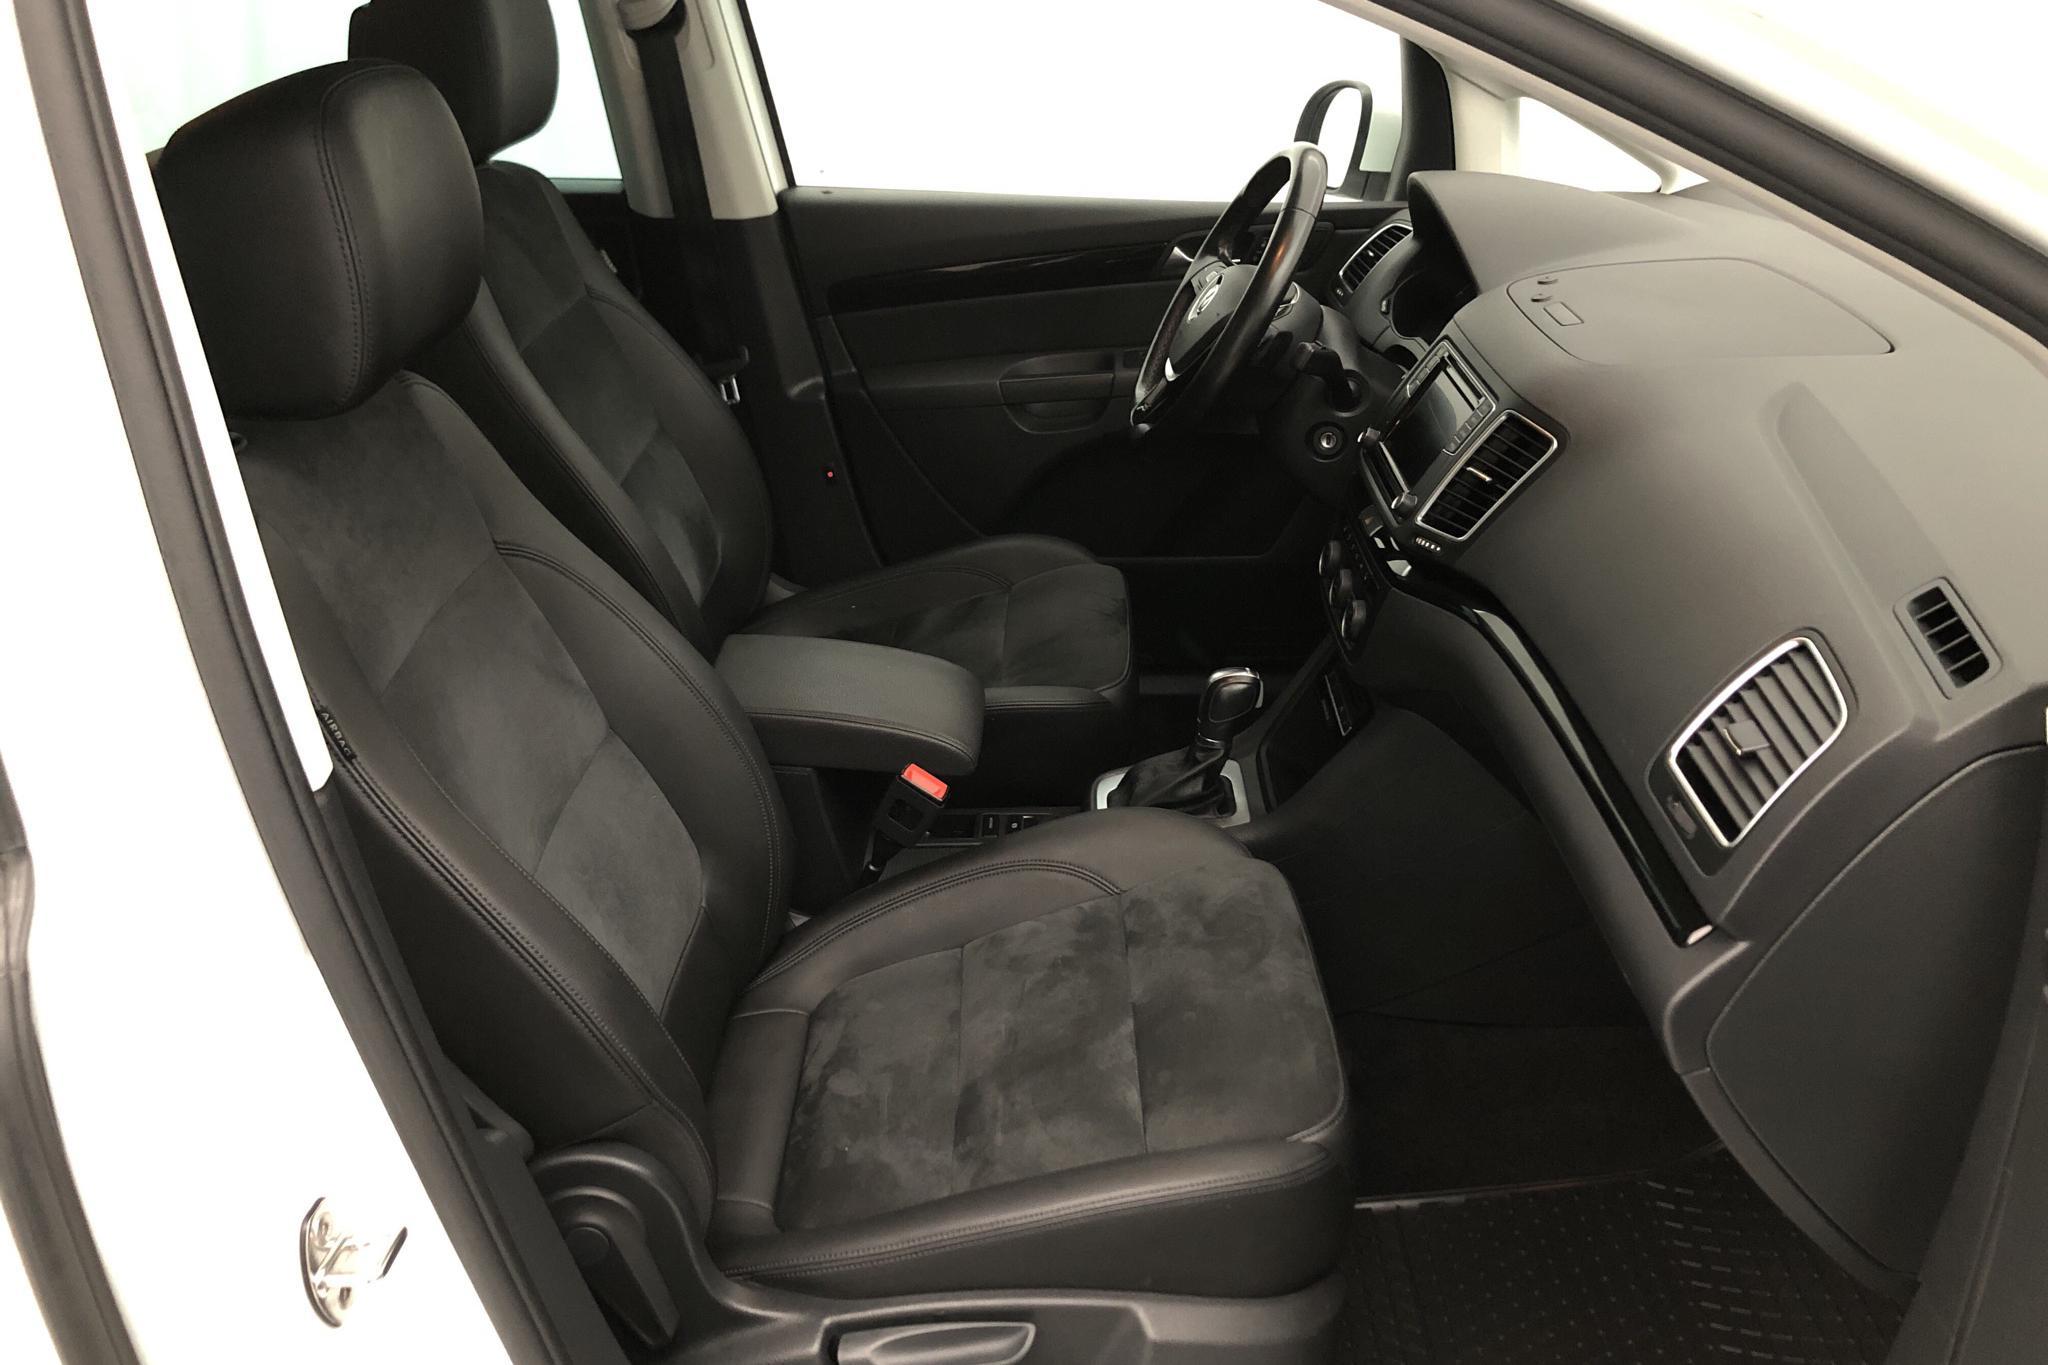 VW Sharan 2.0 TDI 4Motion (184hk) - 118 310 km - Automatic - white - 2017